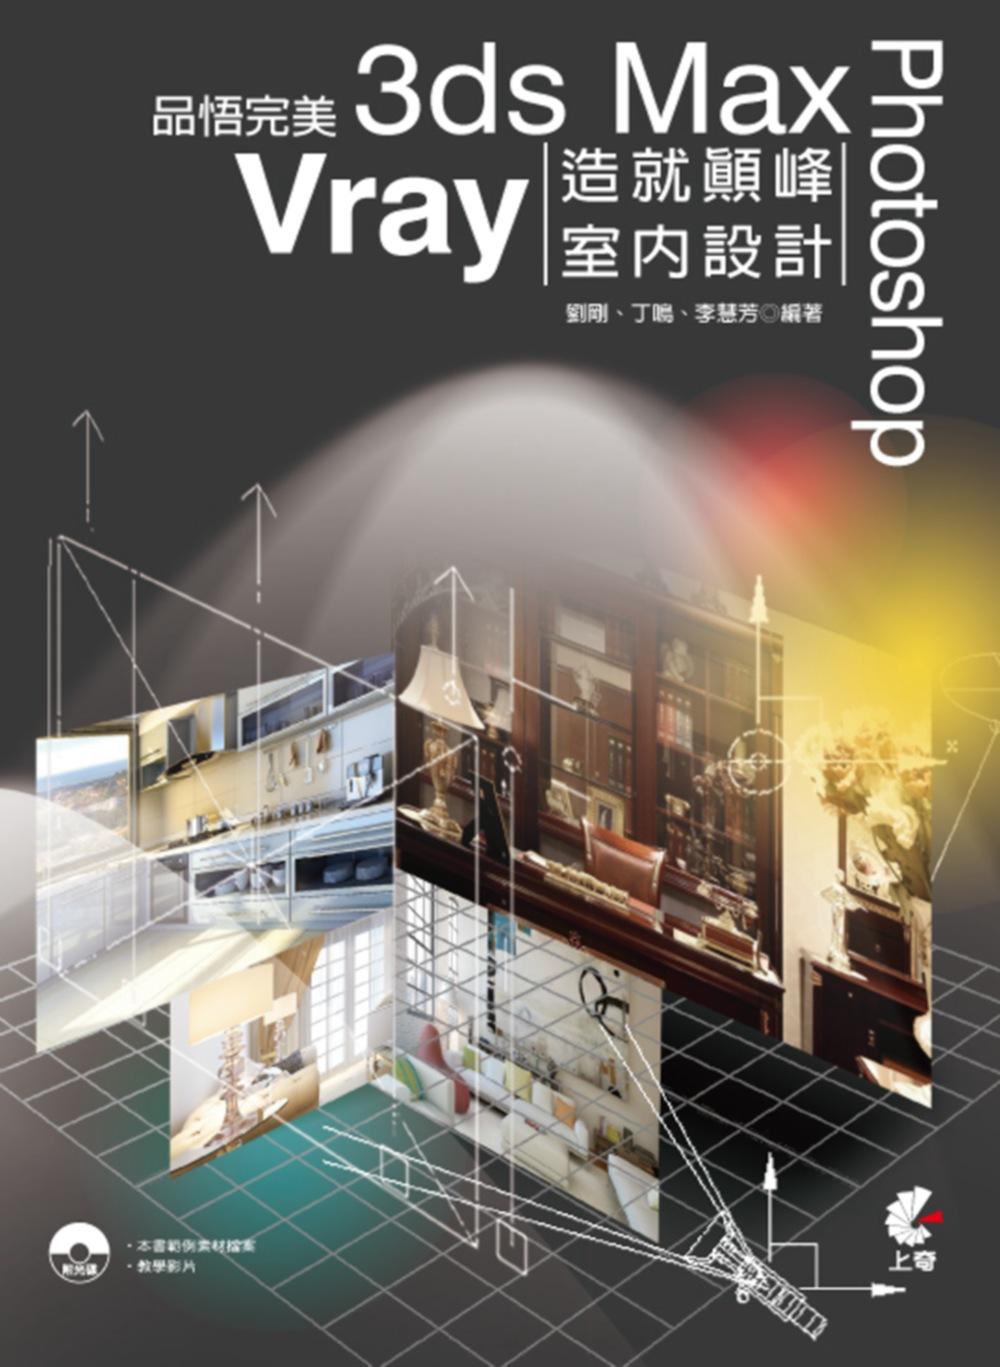 品悟完美:3ds Max Vray Photoshop造就顛峰室內 ^(附光碟^)